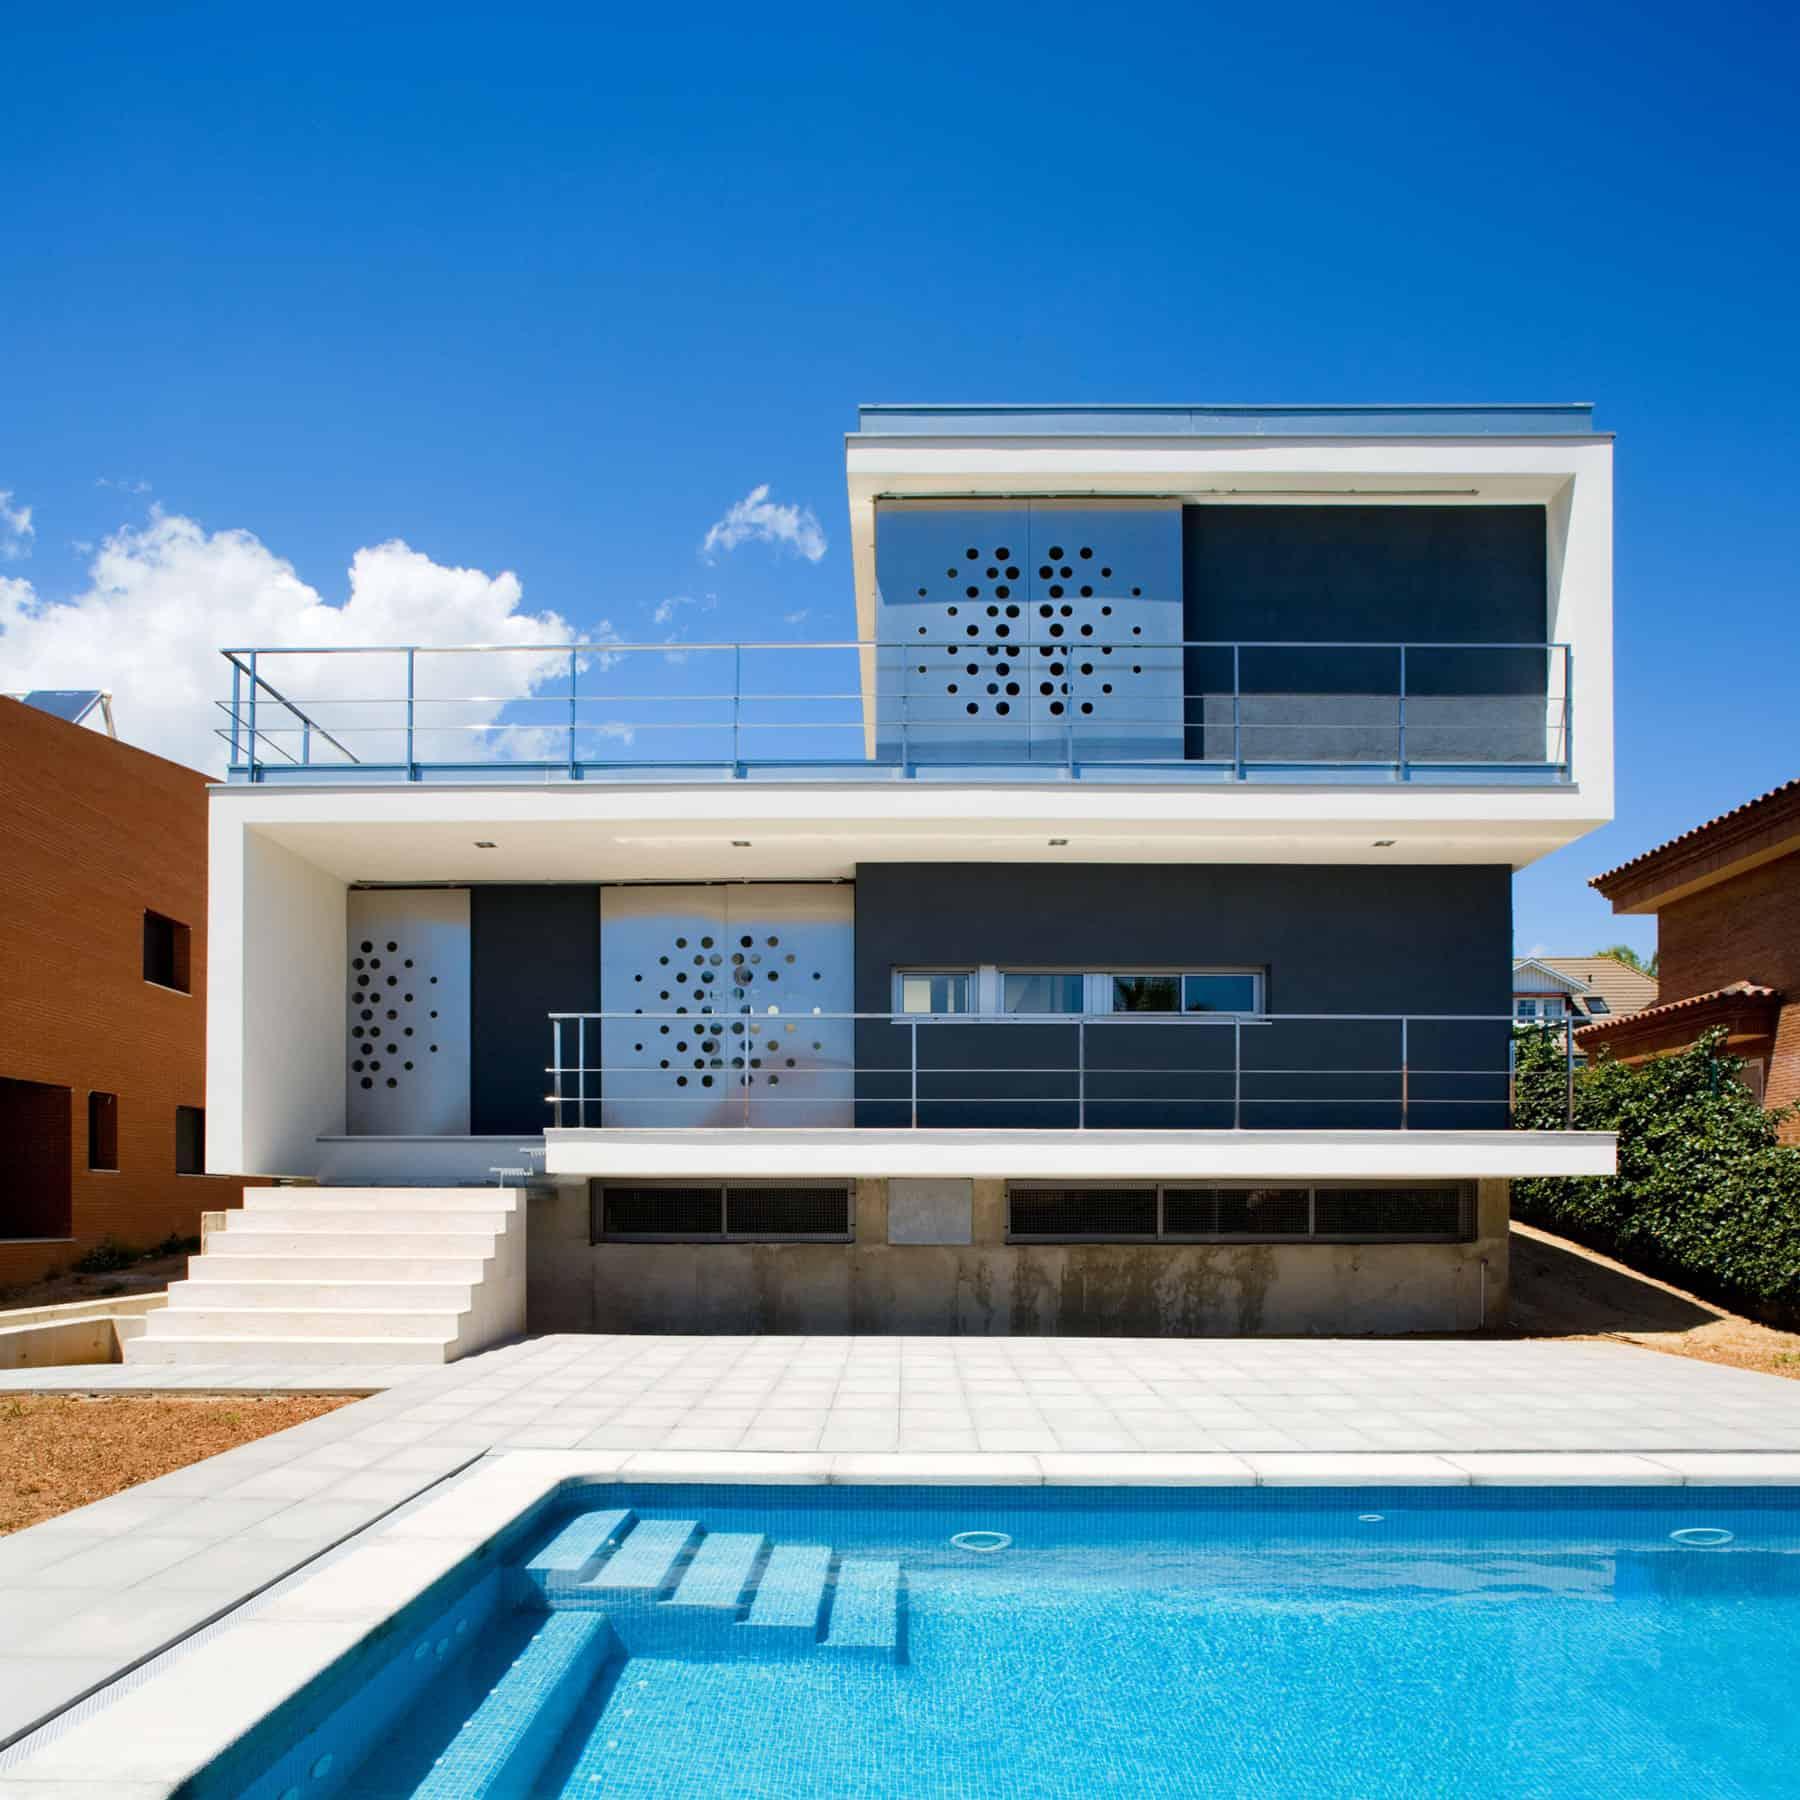 Ch_V House by Aguilera Guerrero